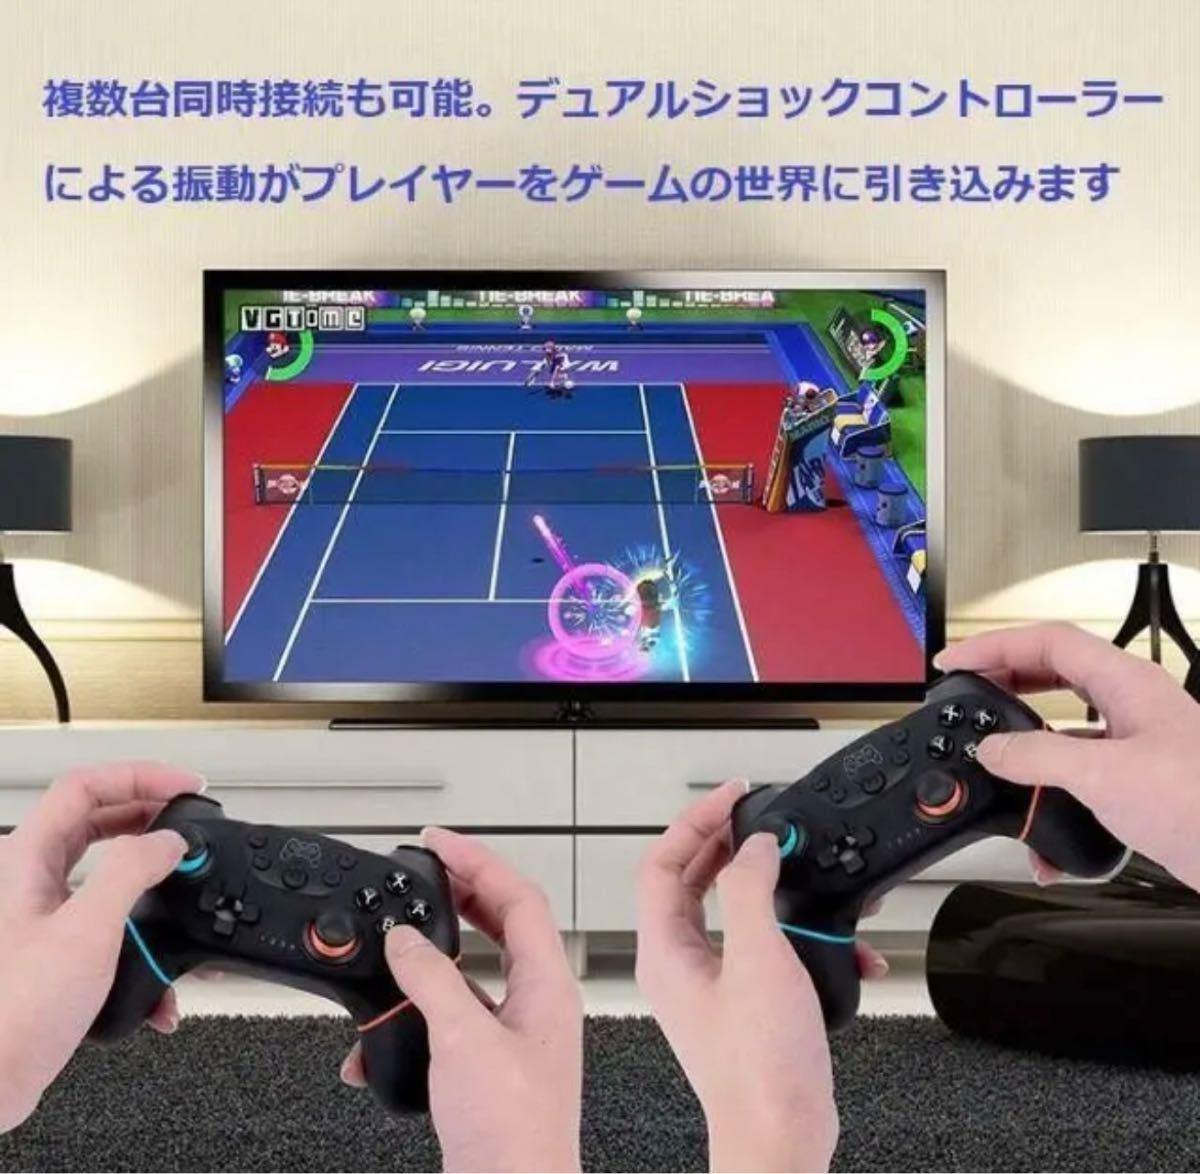 Switch スイッチ コントローラー 任天堂 プロコン ジョイコン ワイヤレス